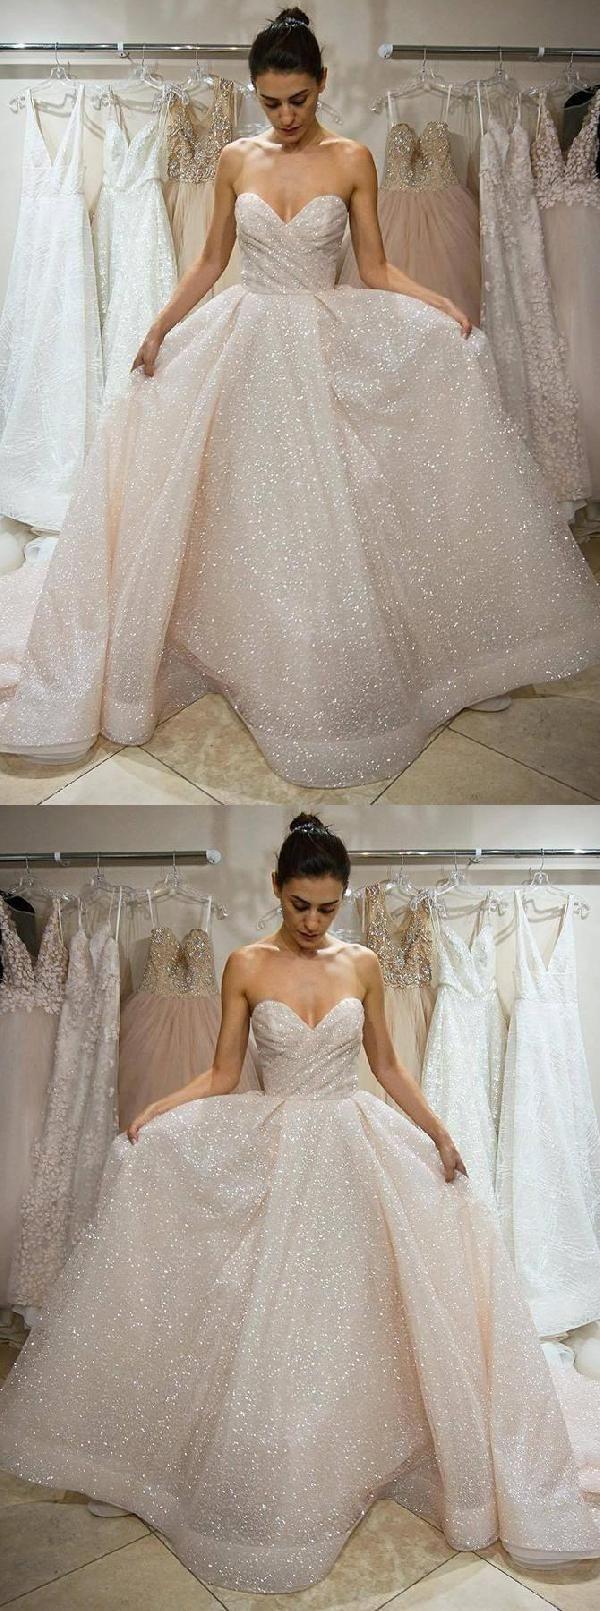 Fancy ivory wedding dresses lace wedding dresses aline wedding